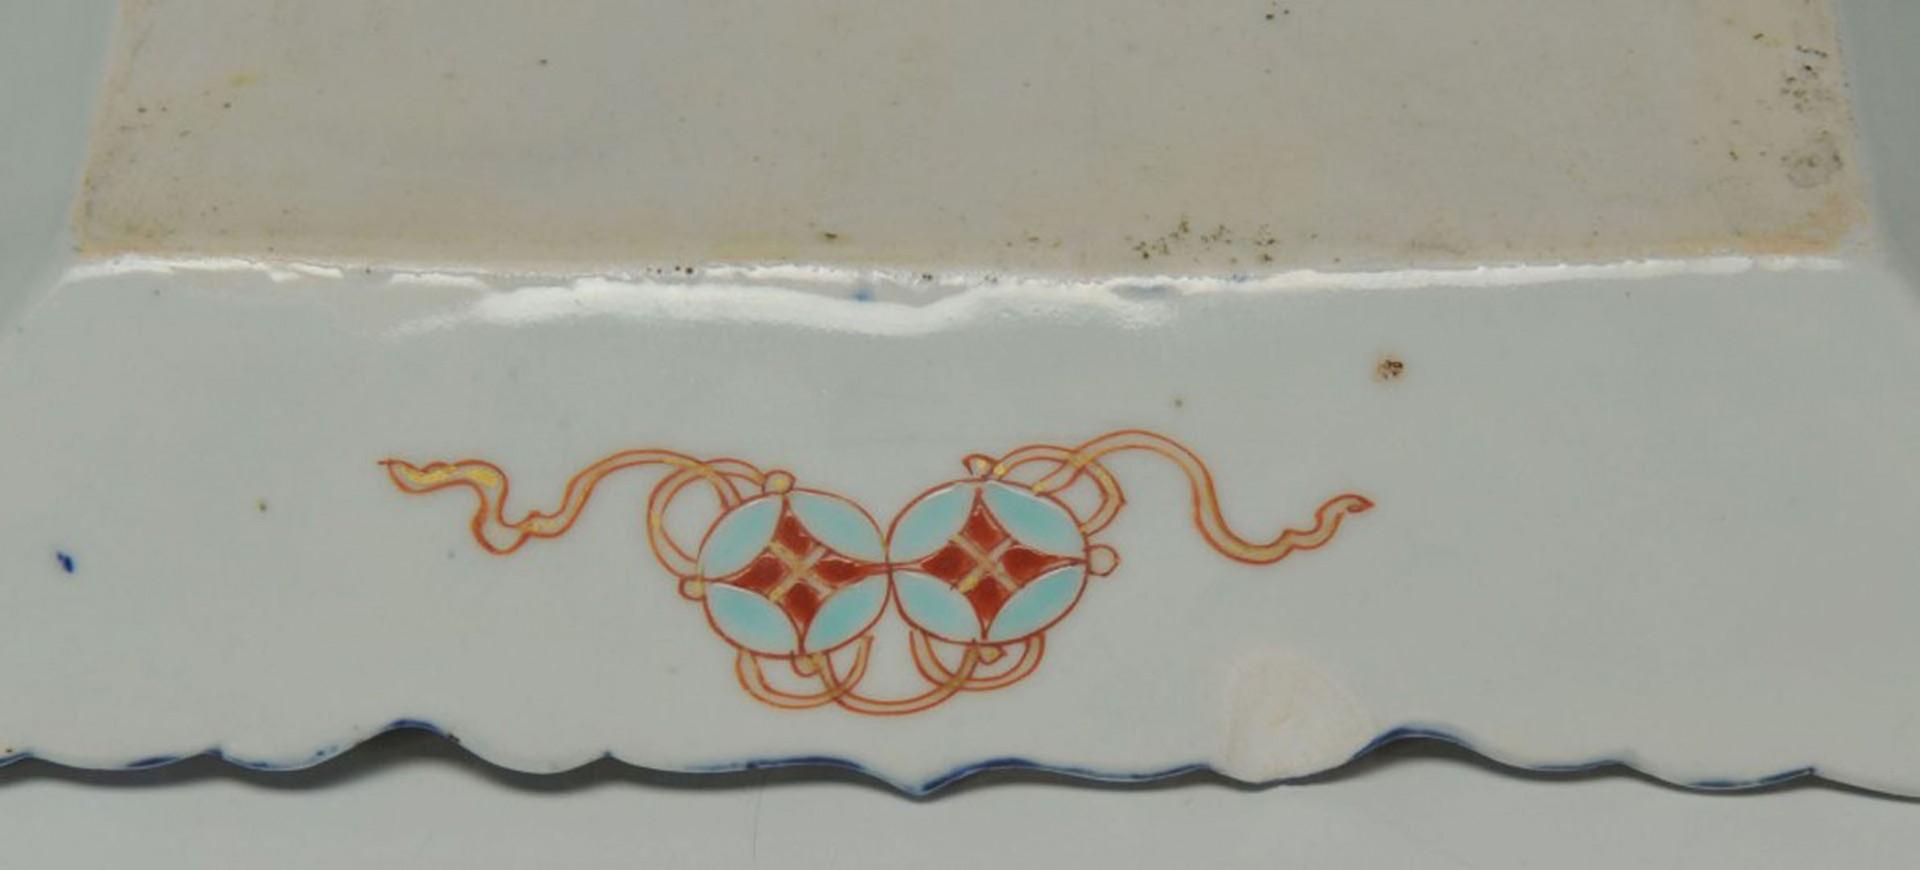 Lot 2872285: Chinese Famille Rose Vase